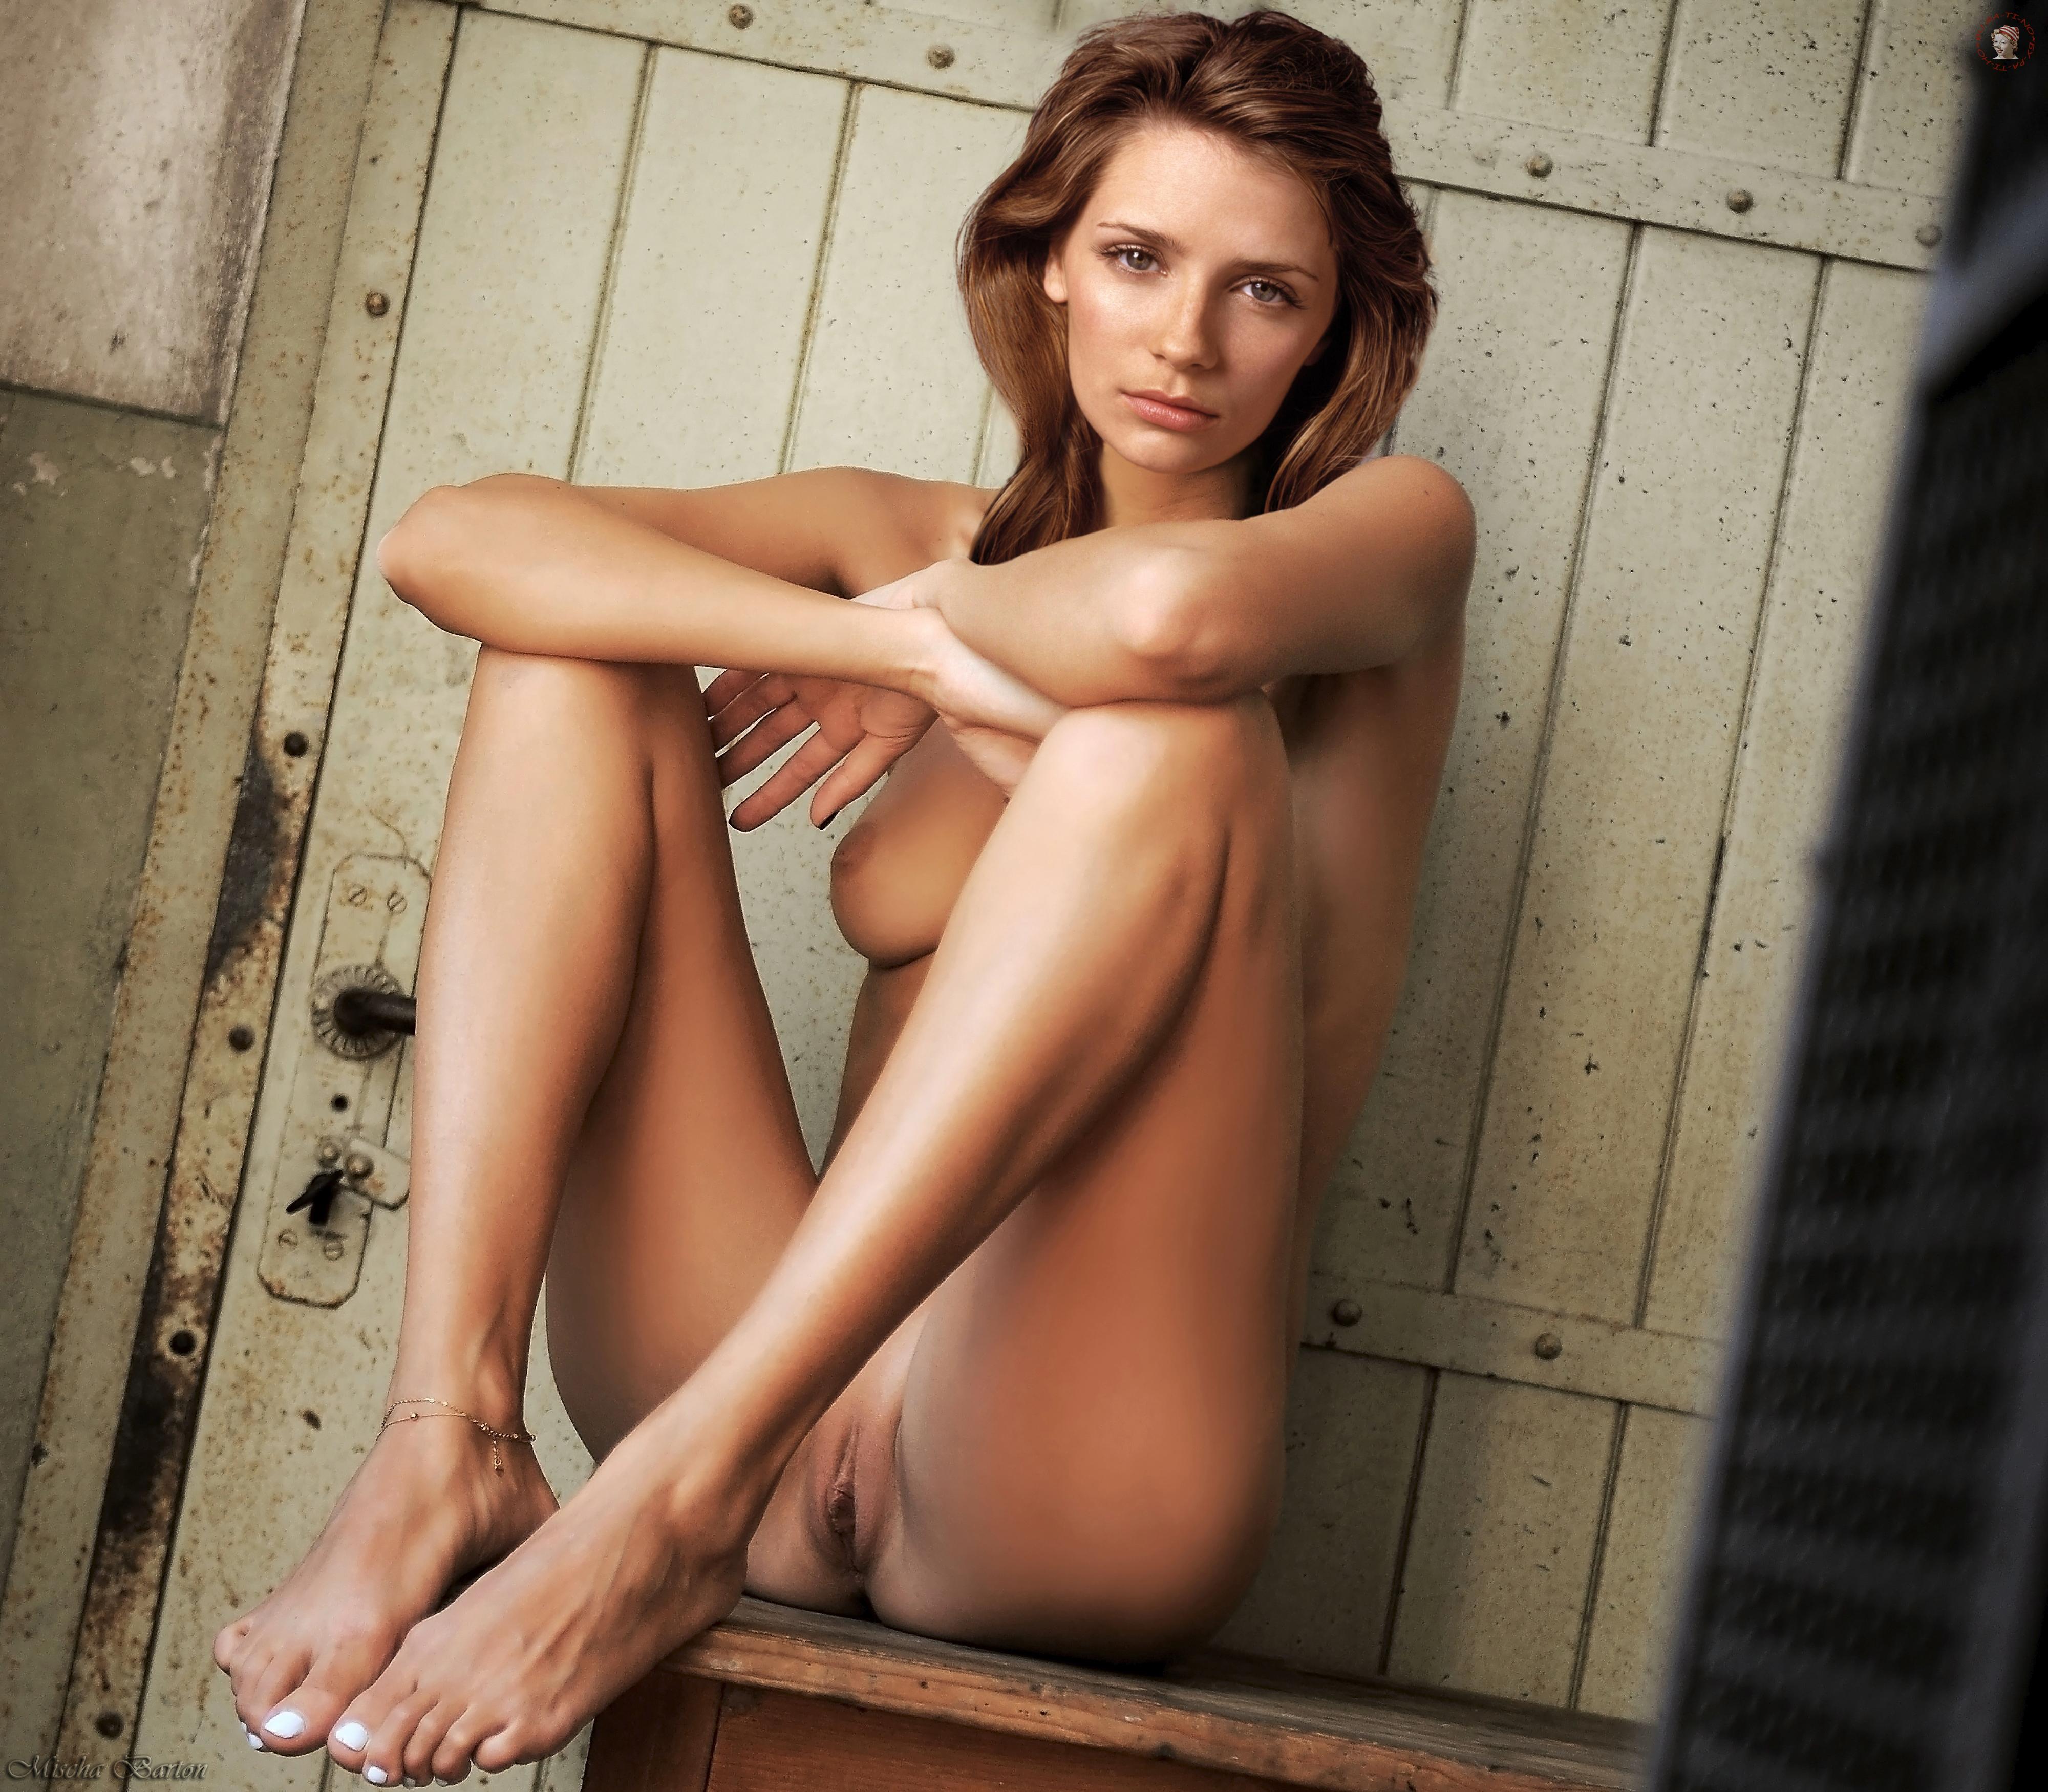 Mischa barton naked scene